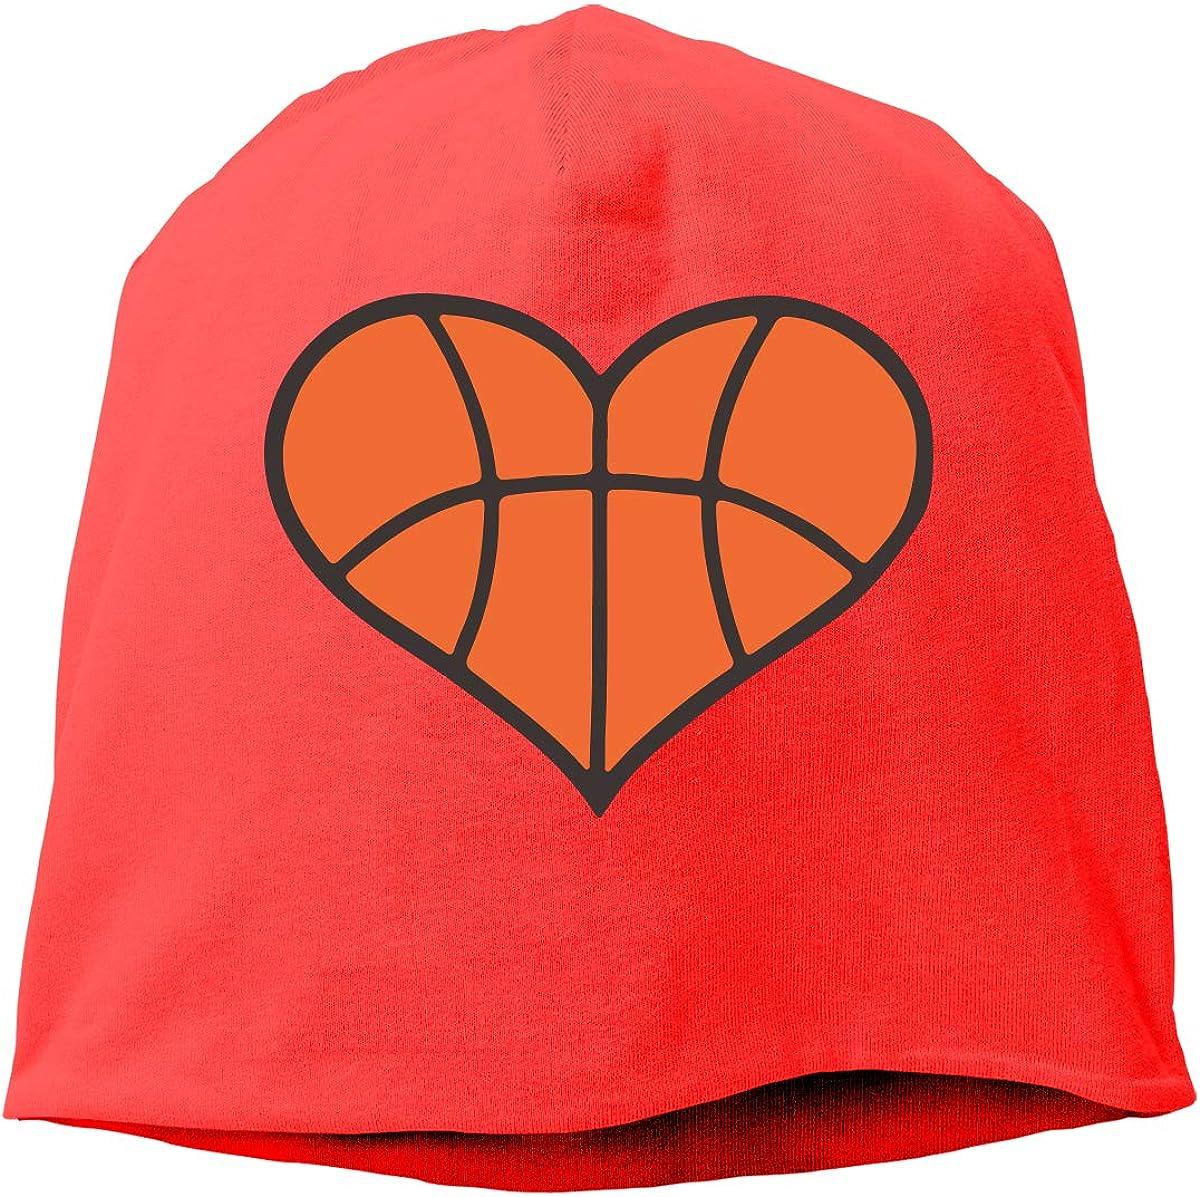 TLPM9LKMBM Basketball Heart Beanie Skull Cap for Women and Men Winter Warm Daily Hat